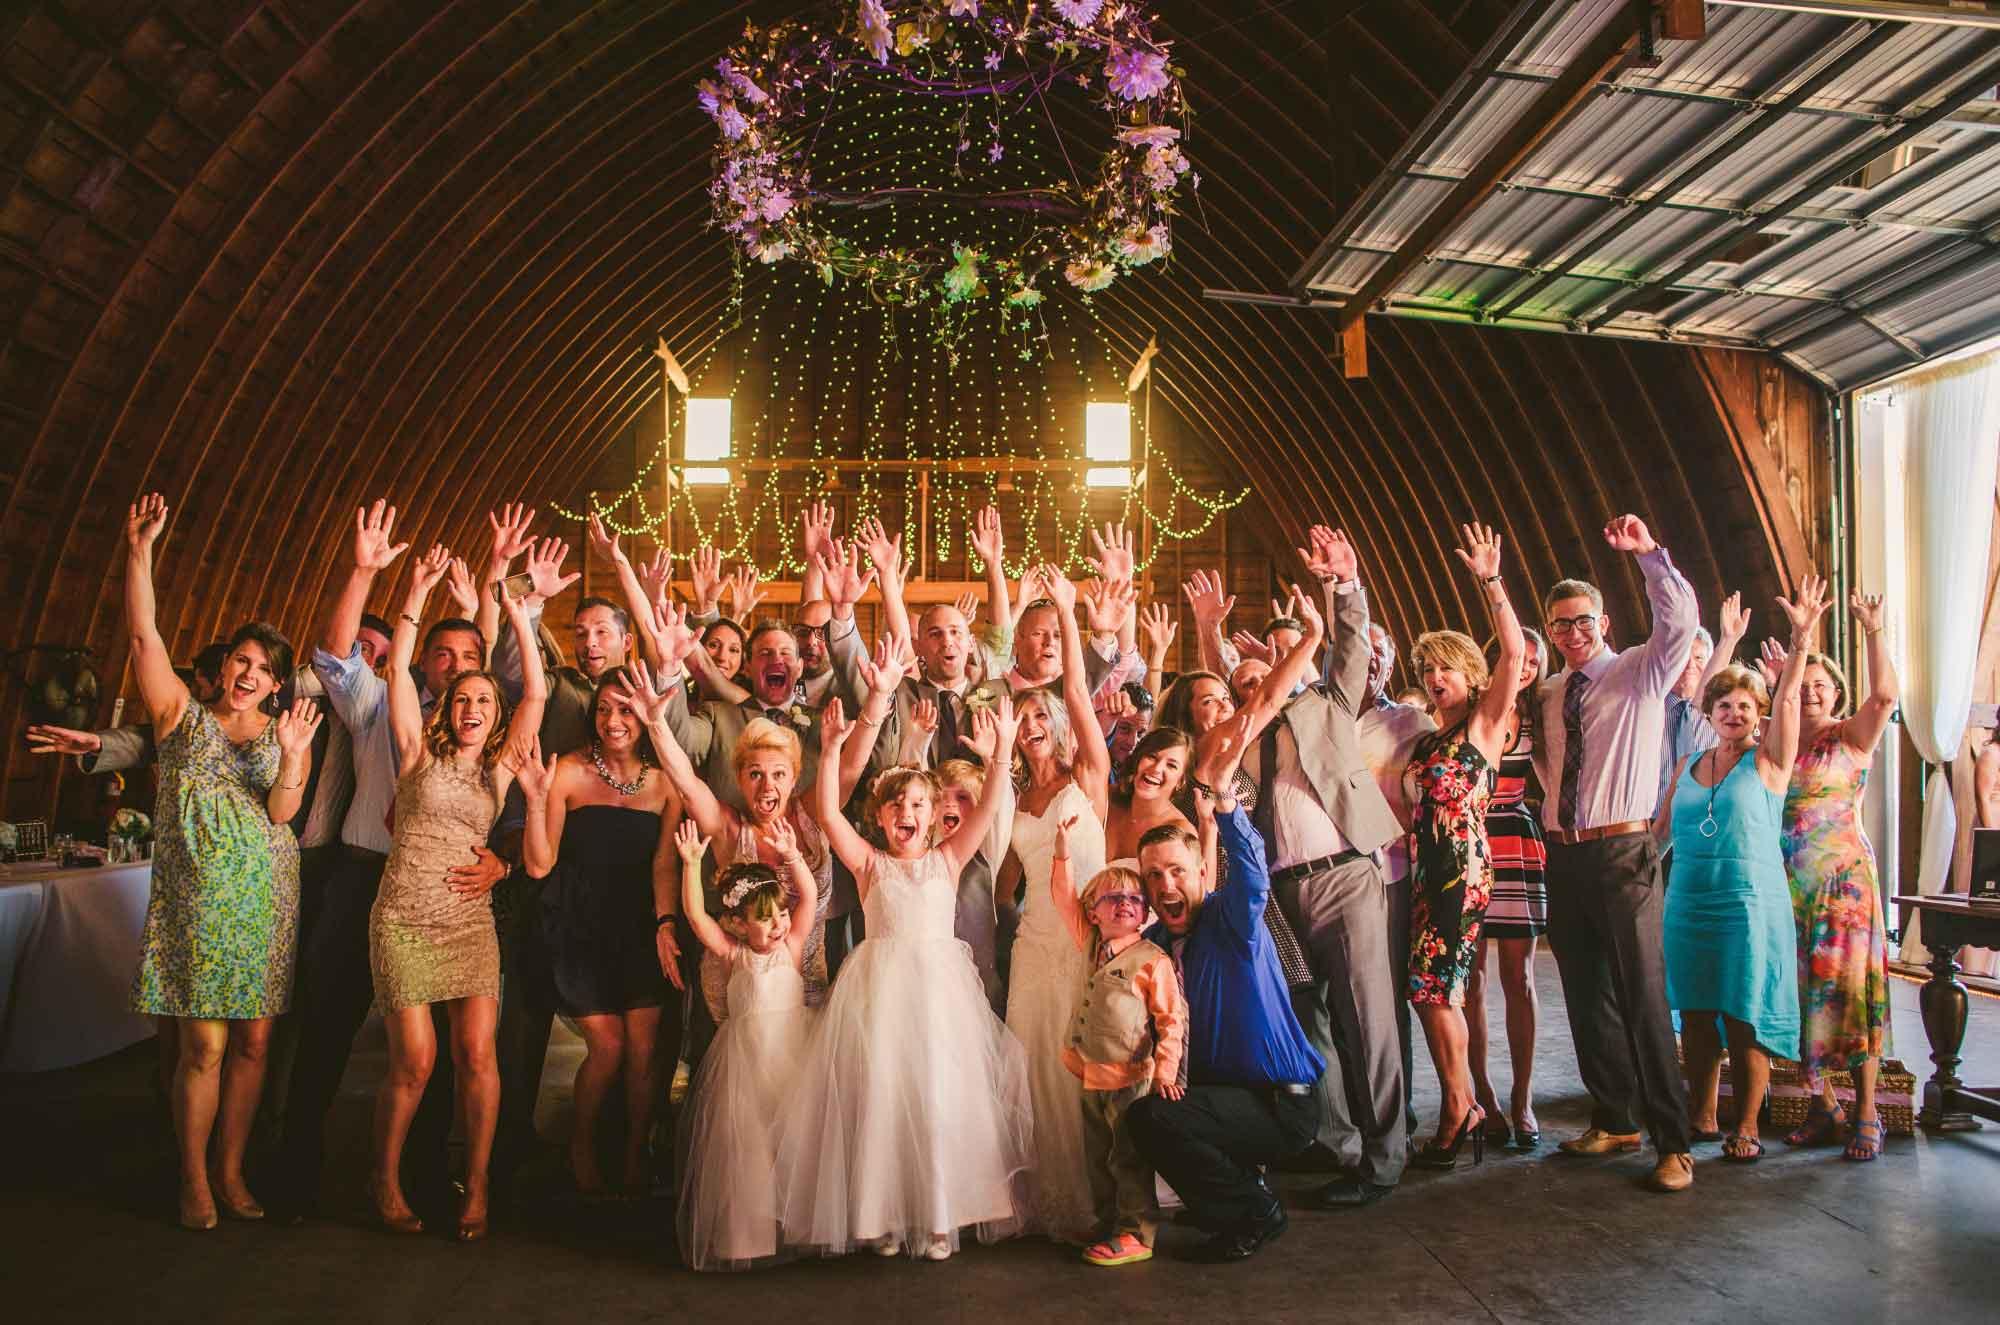 23-wedding-reception-guests-fun-photo.jpg